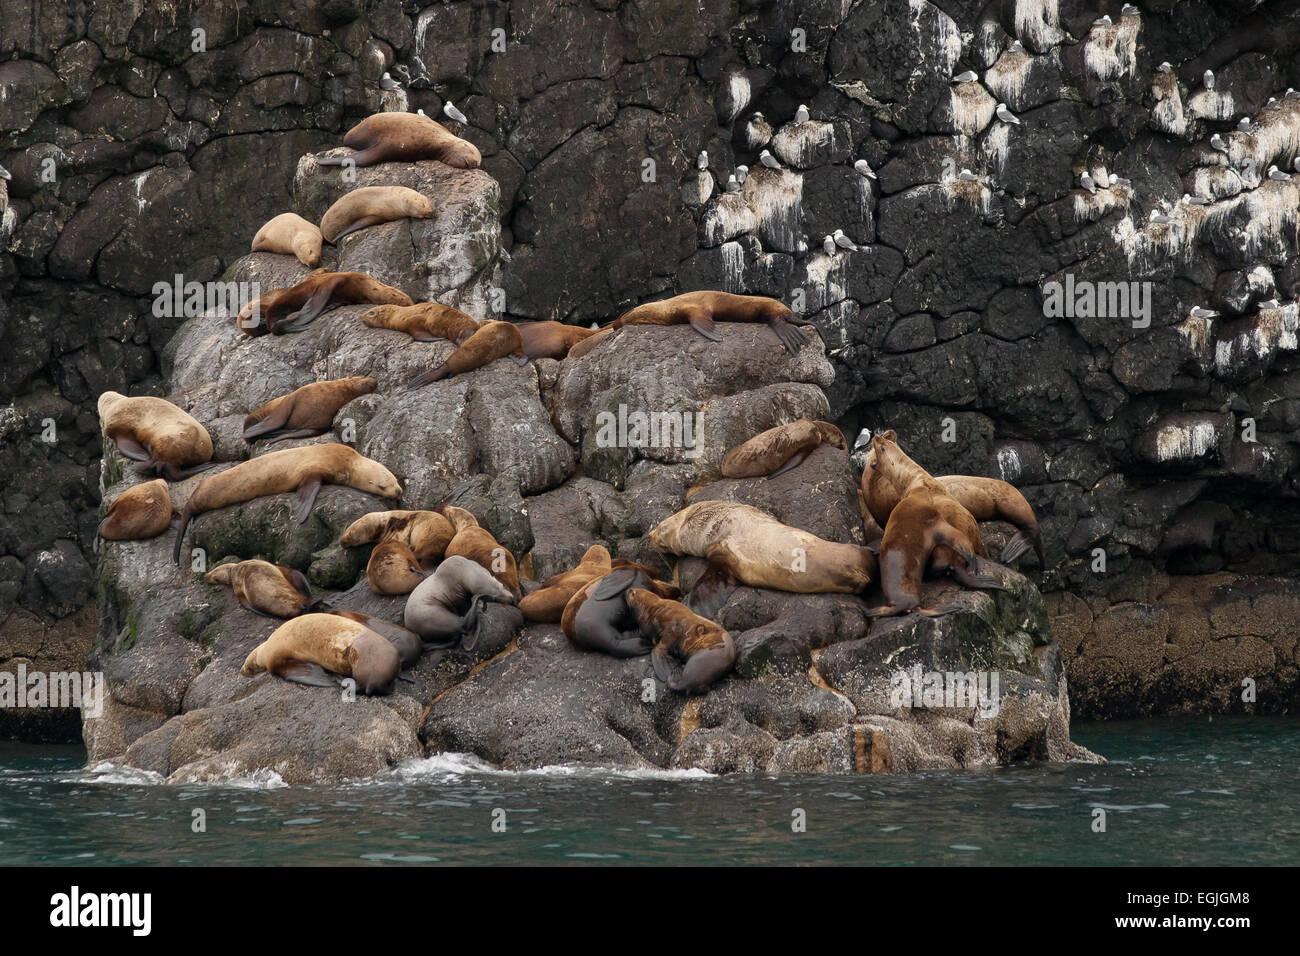 Stellar sea lions, Kenai Fijords NP, Seward, AK - Stock Image